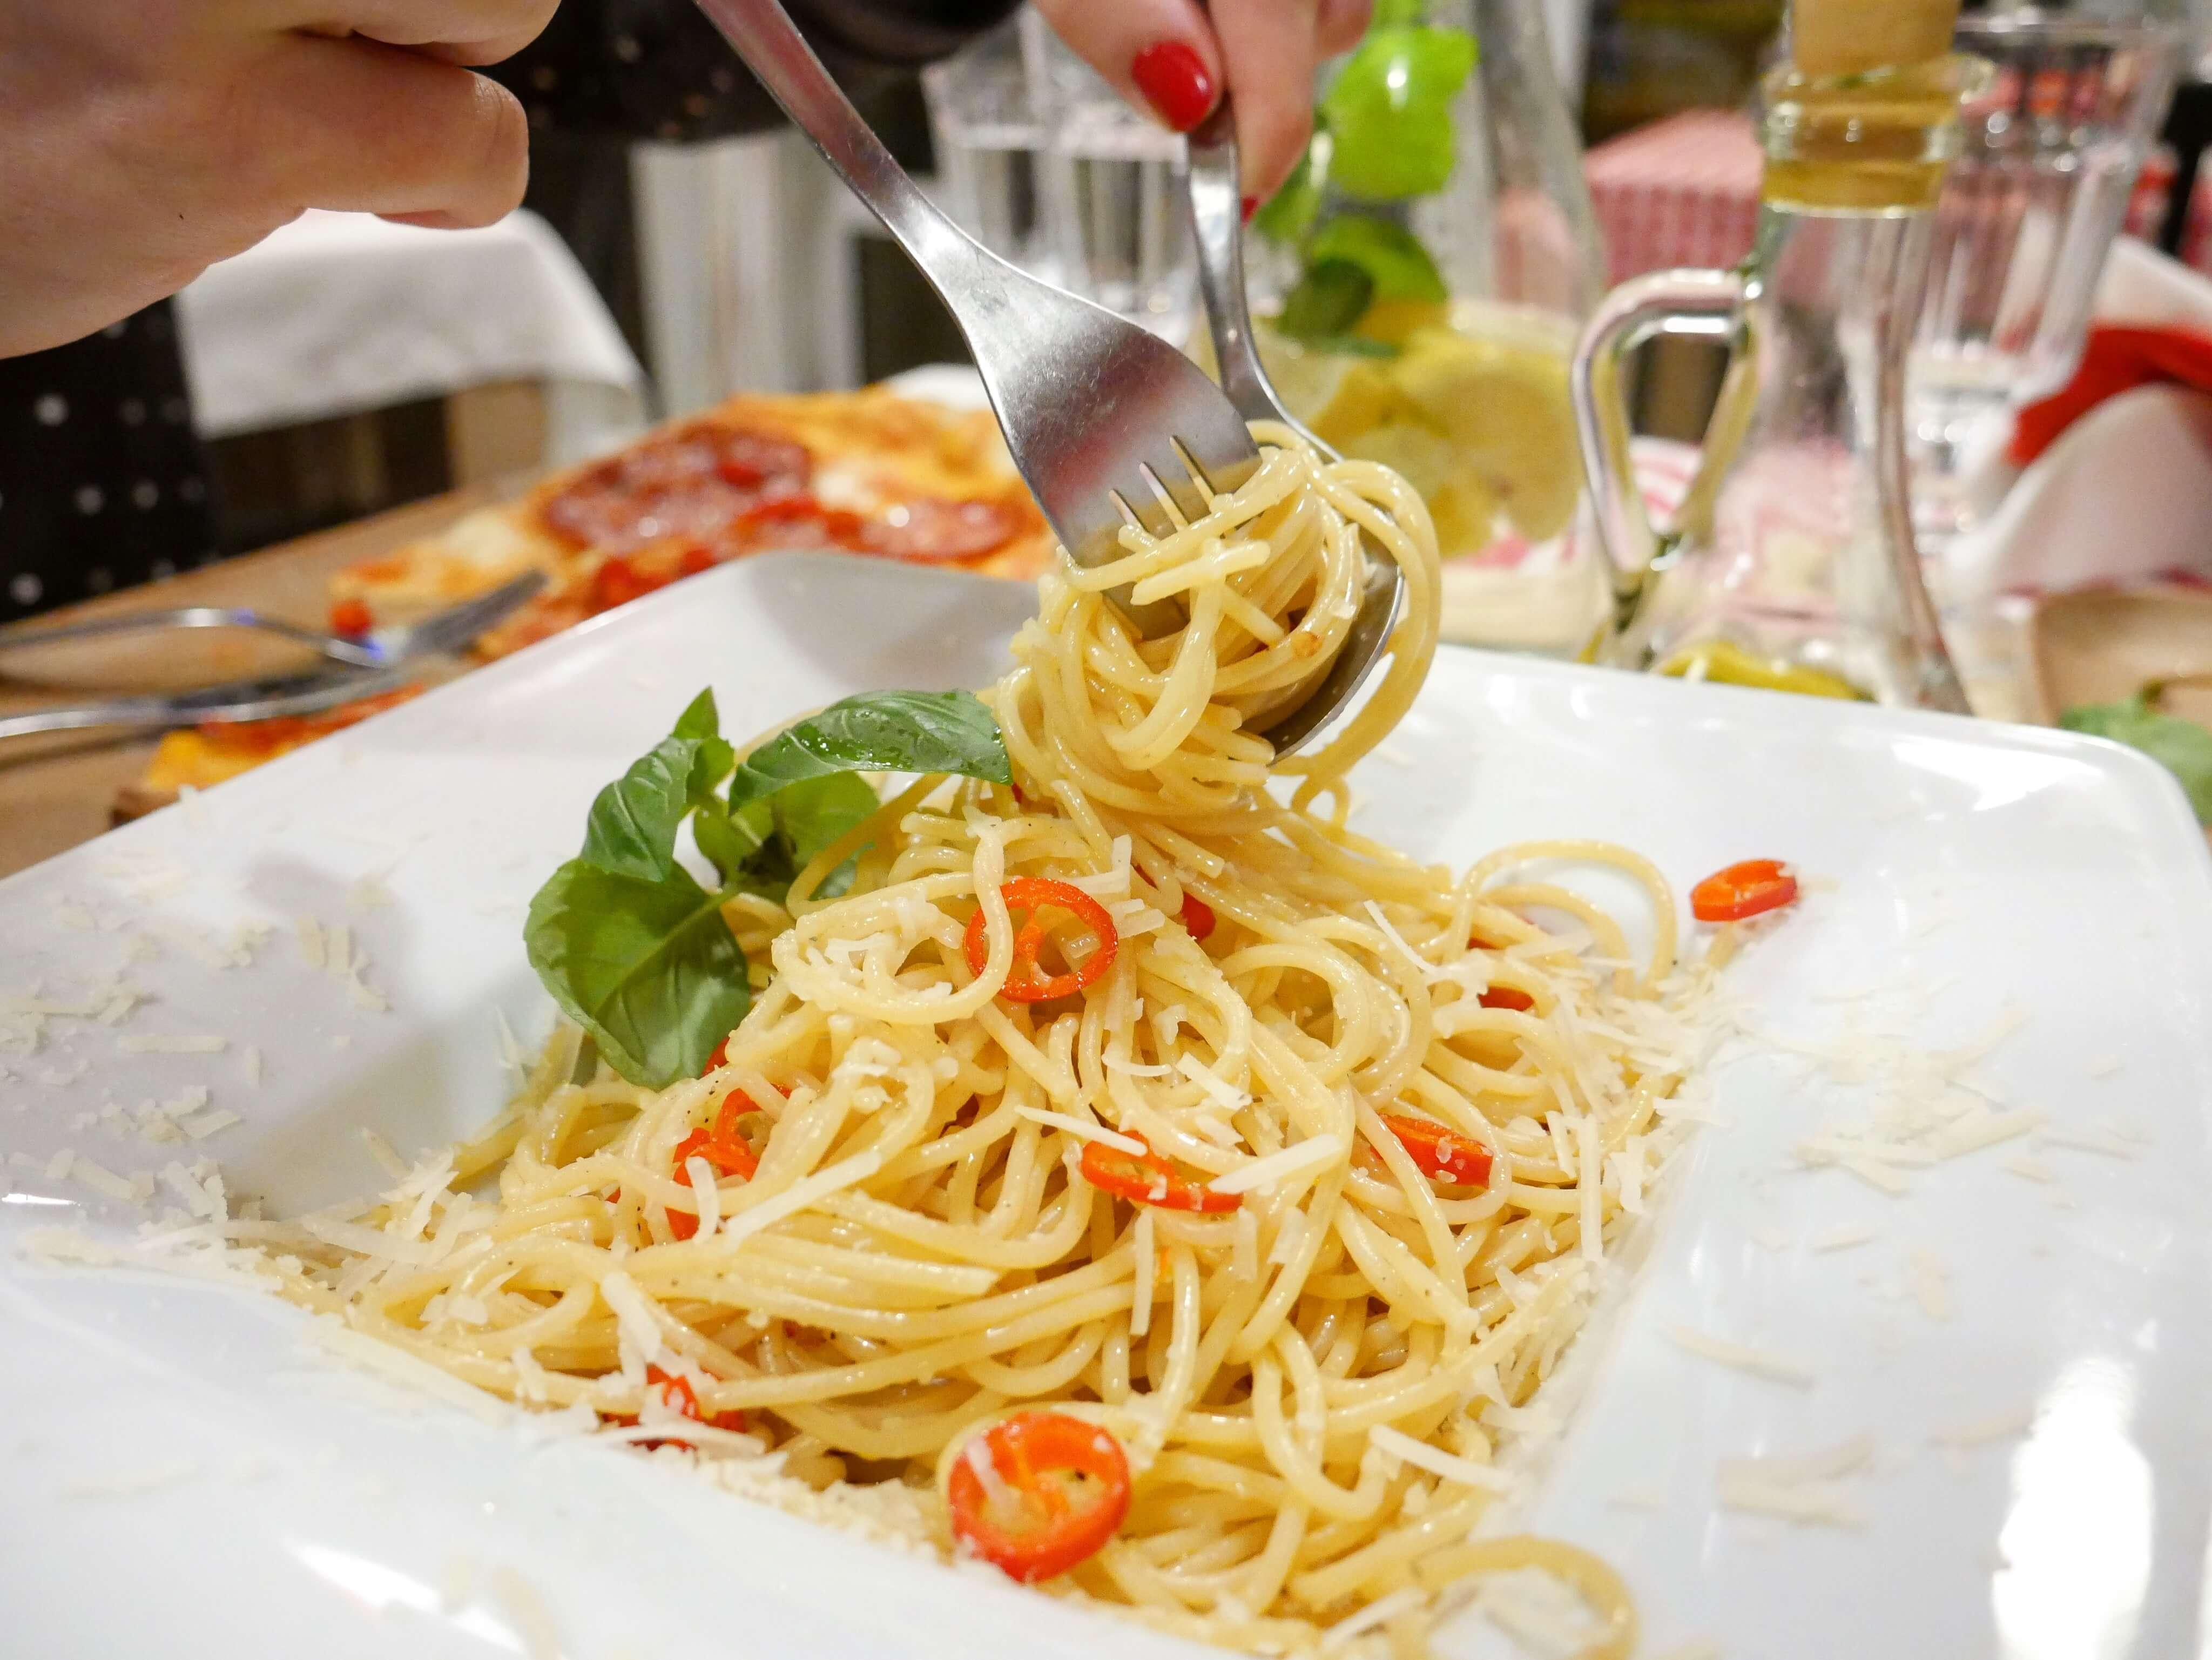 restauracja trattoria bandiera italiana